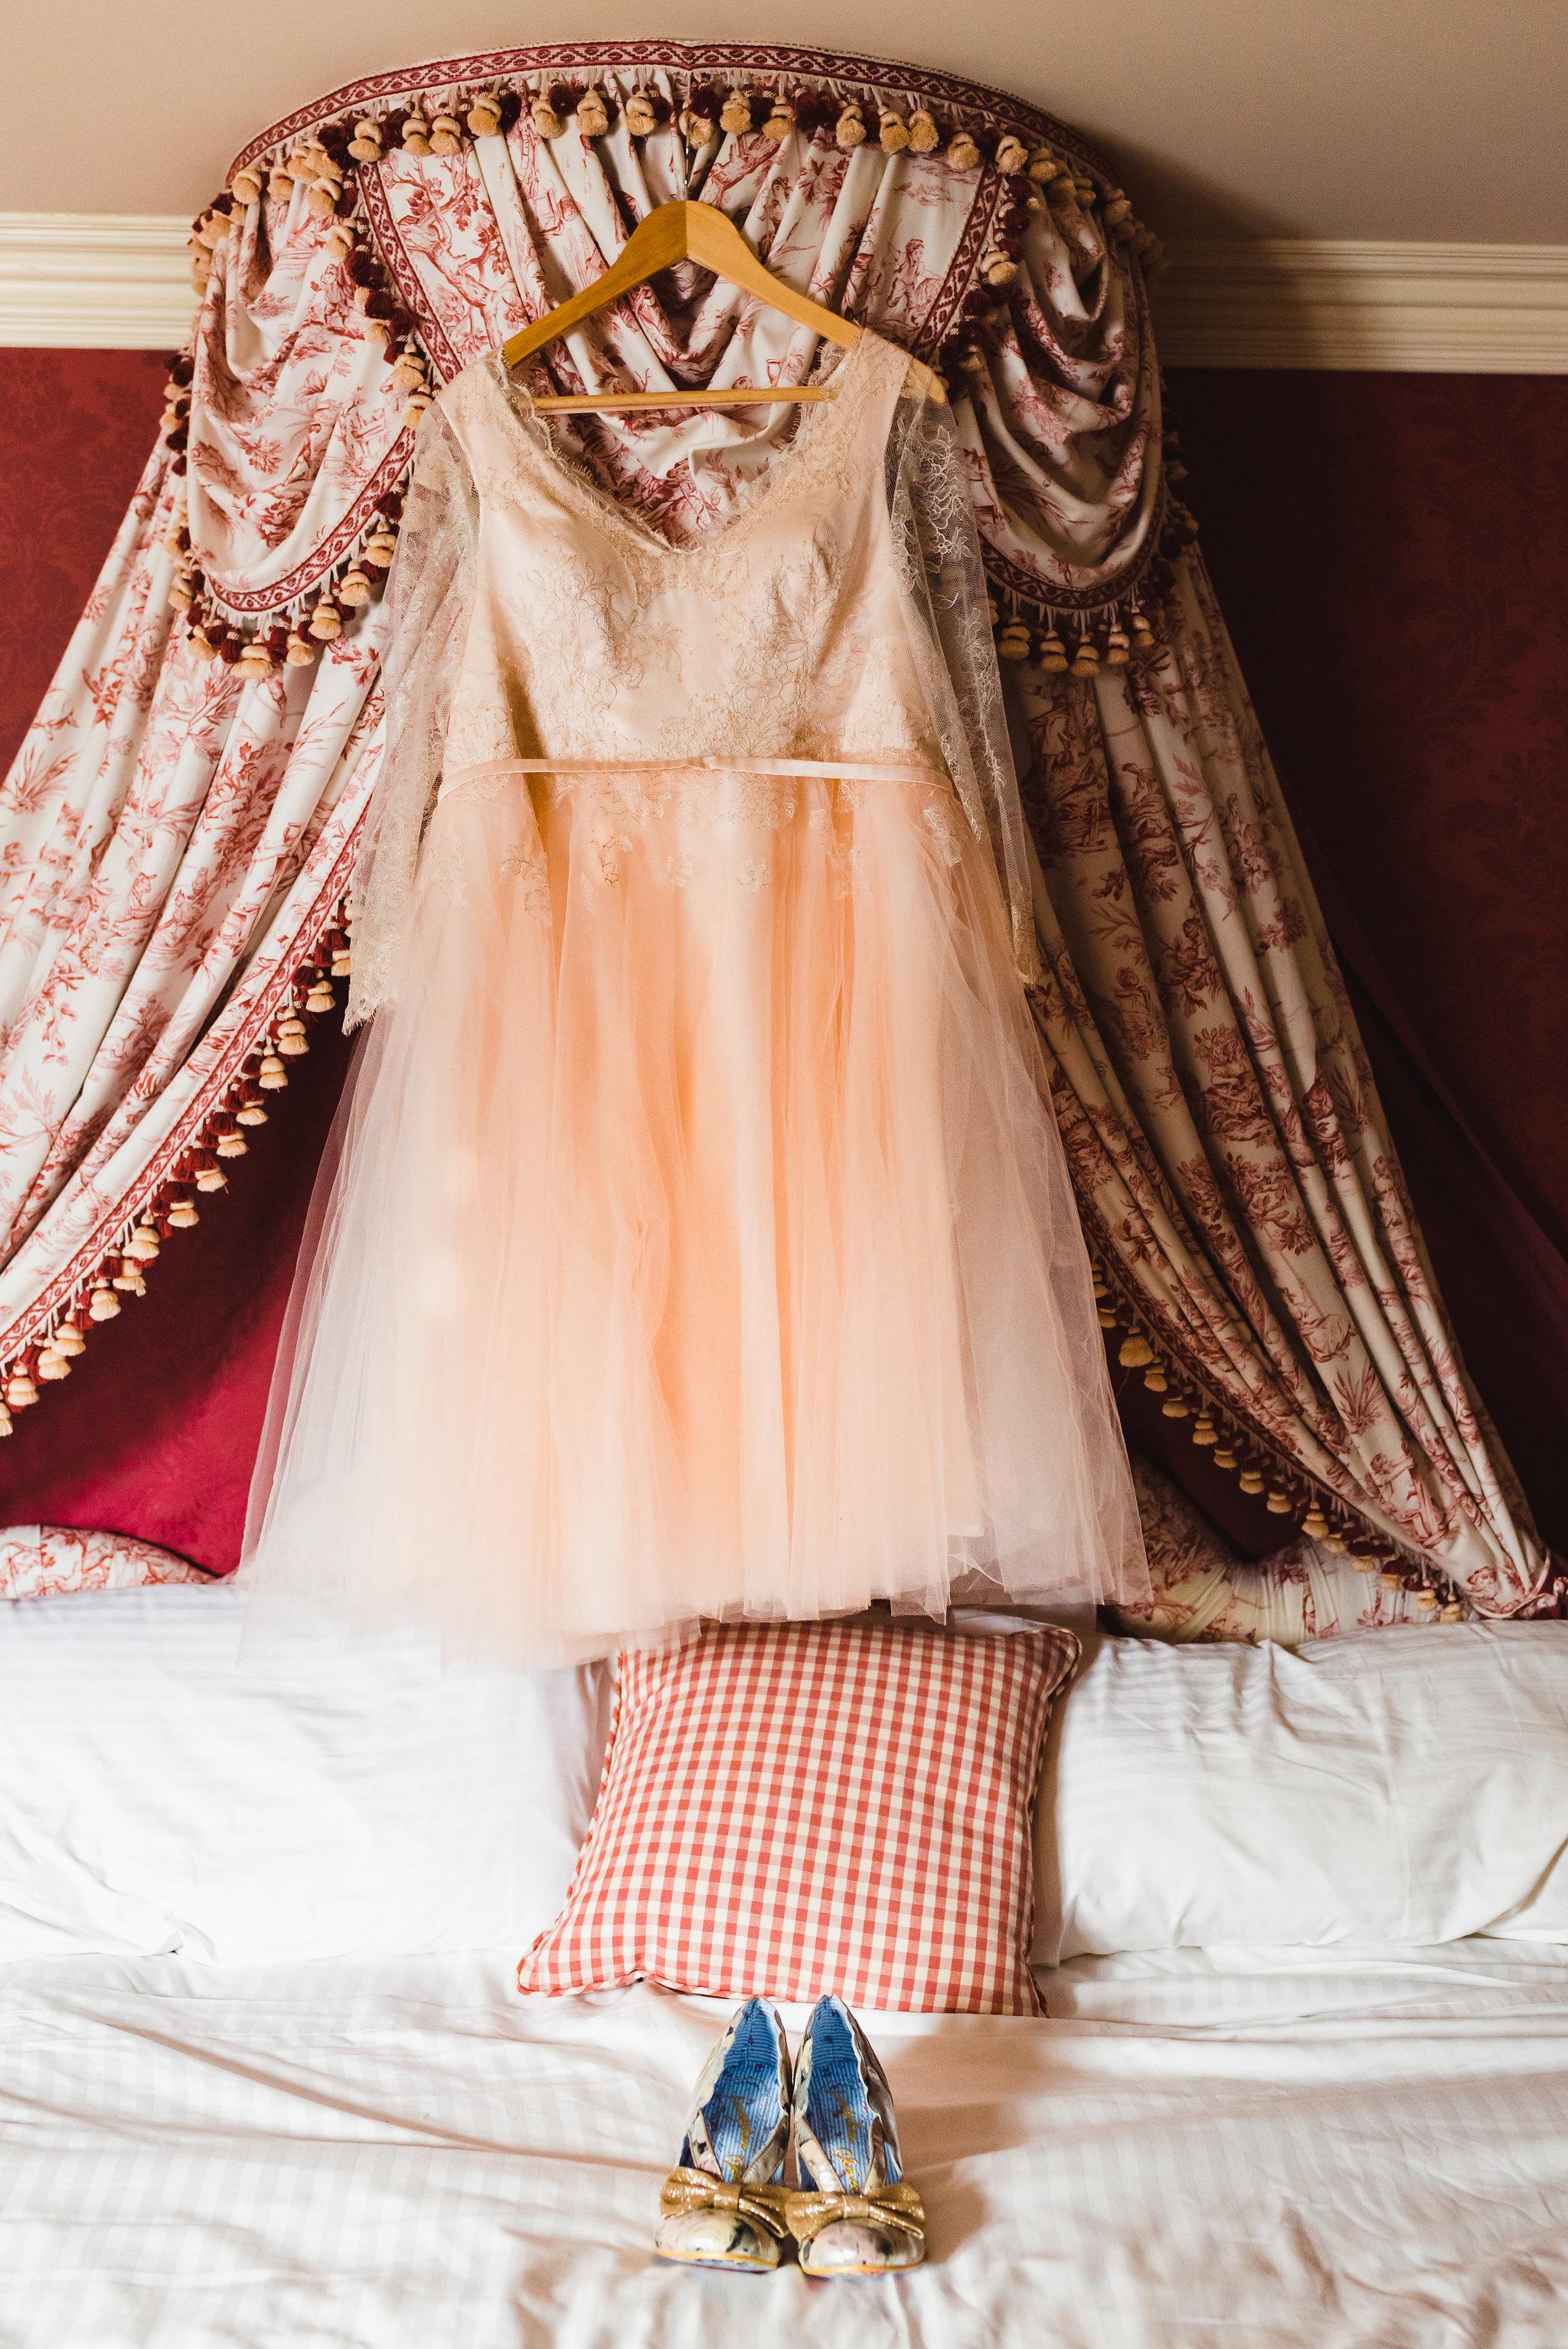 wedding dress hanging on headboard above white bed and wedding shoes Toronto Wedding photographer